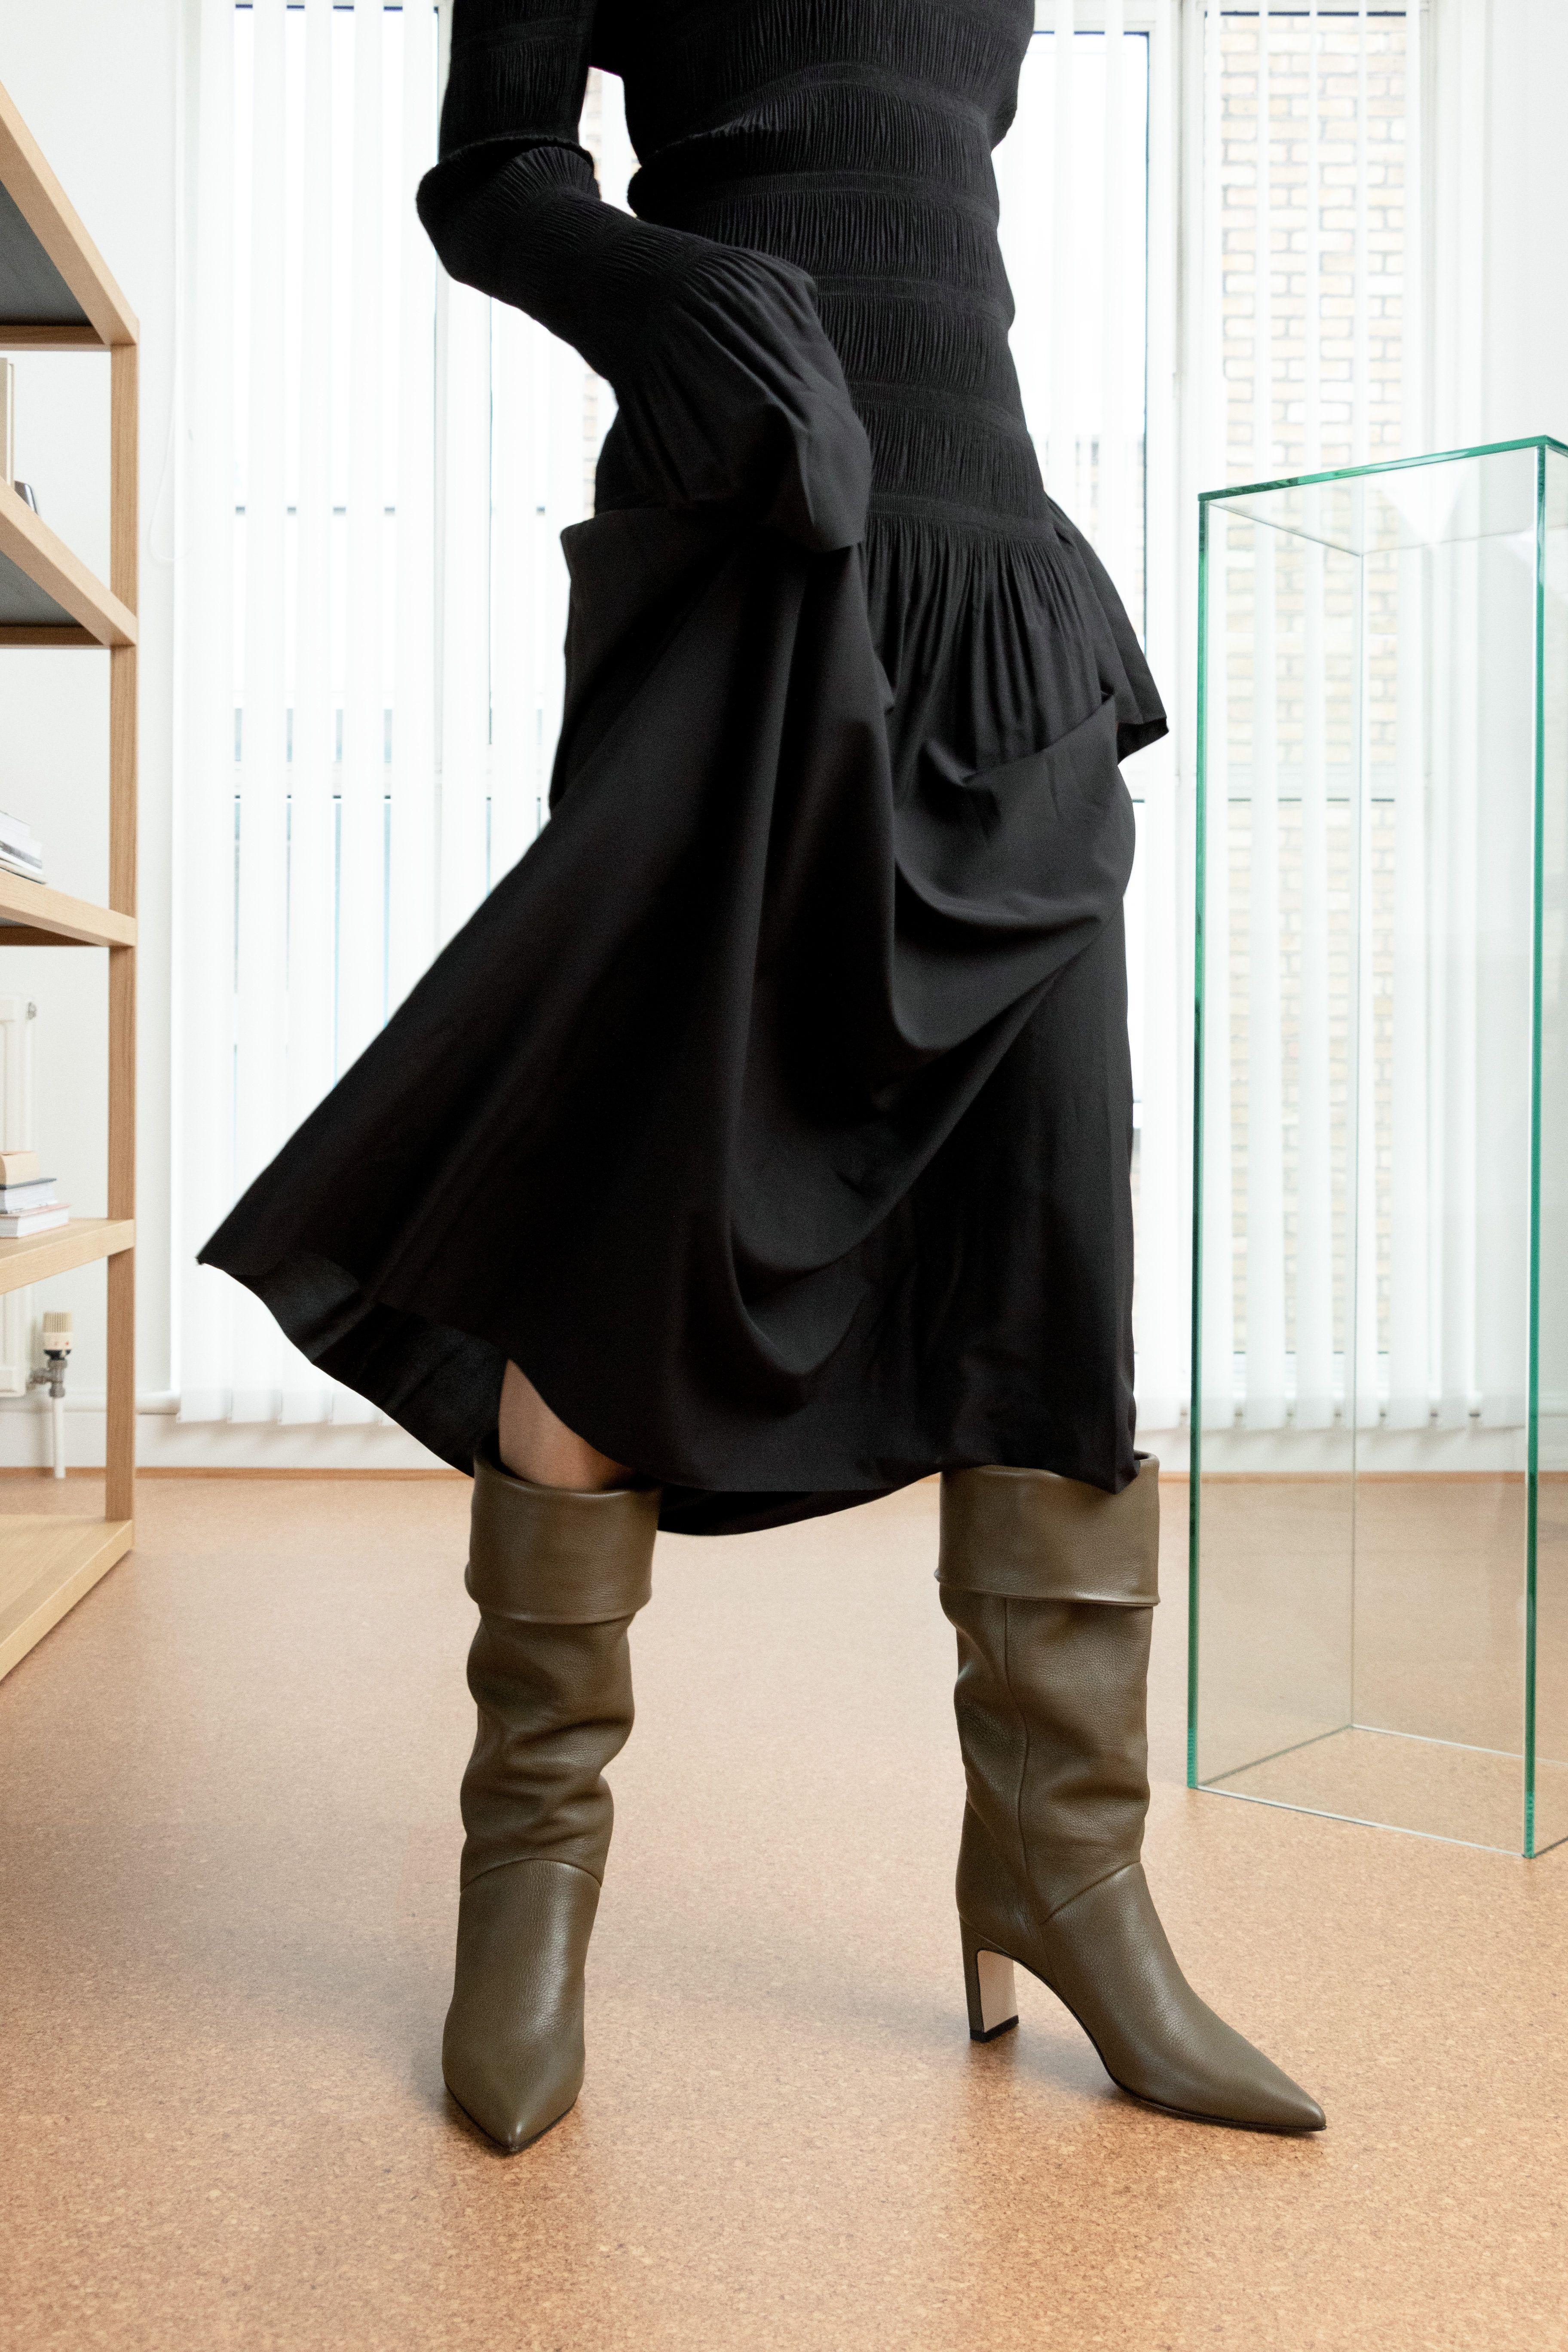 Fashion editorial July 2020 | Fashion, Editorial fashion